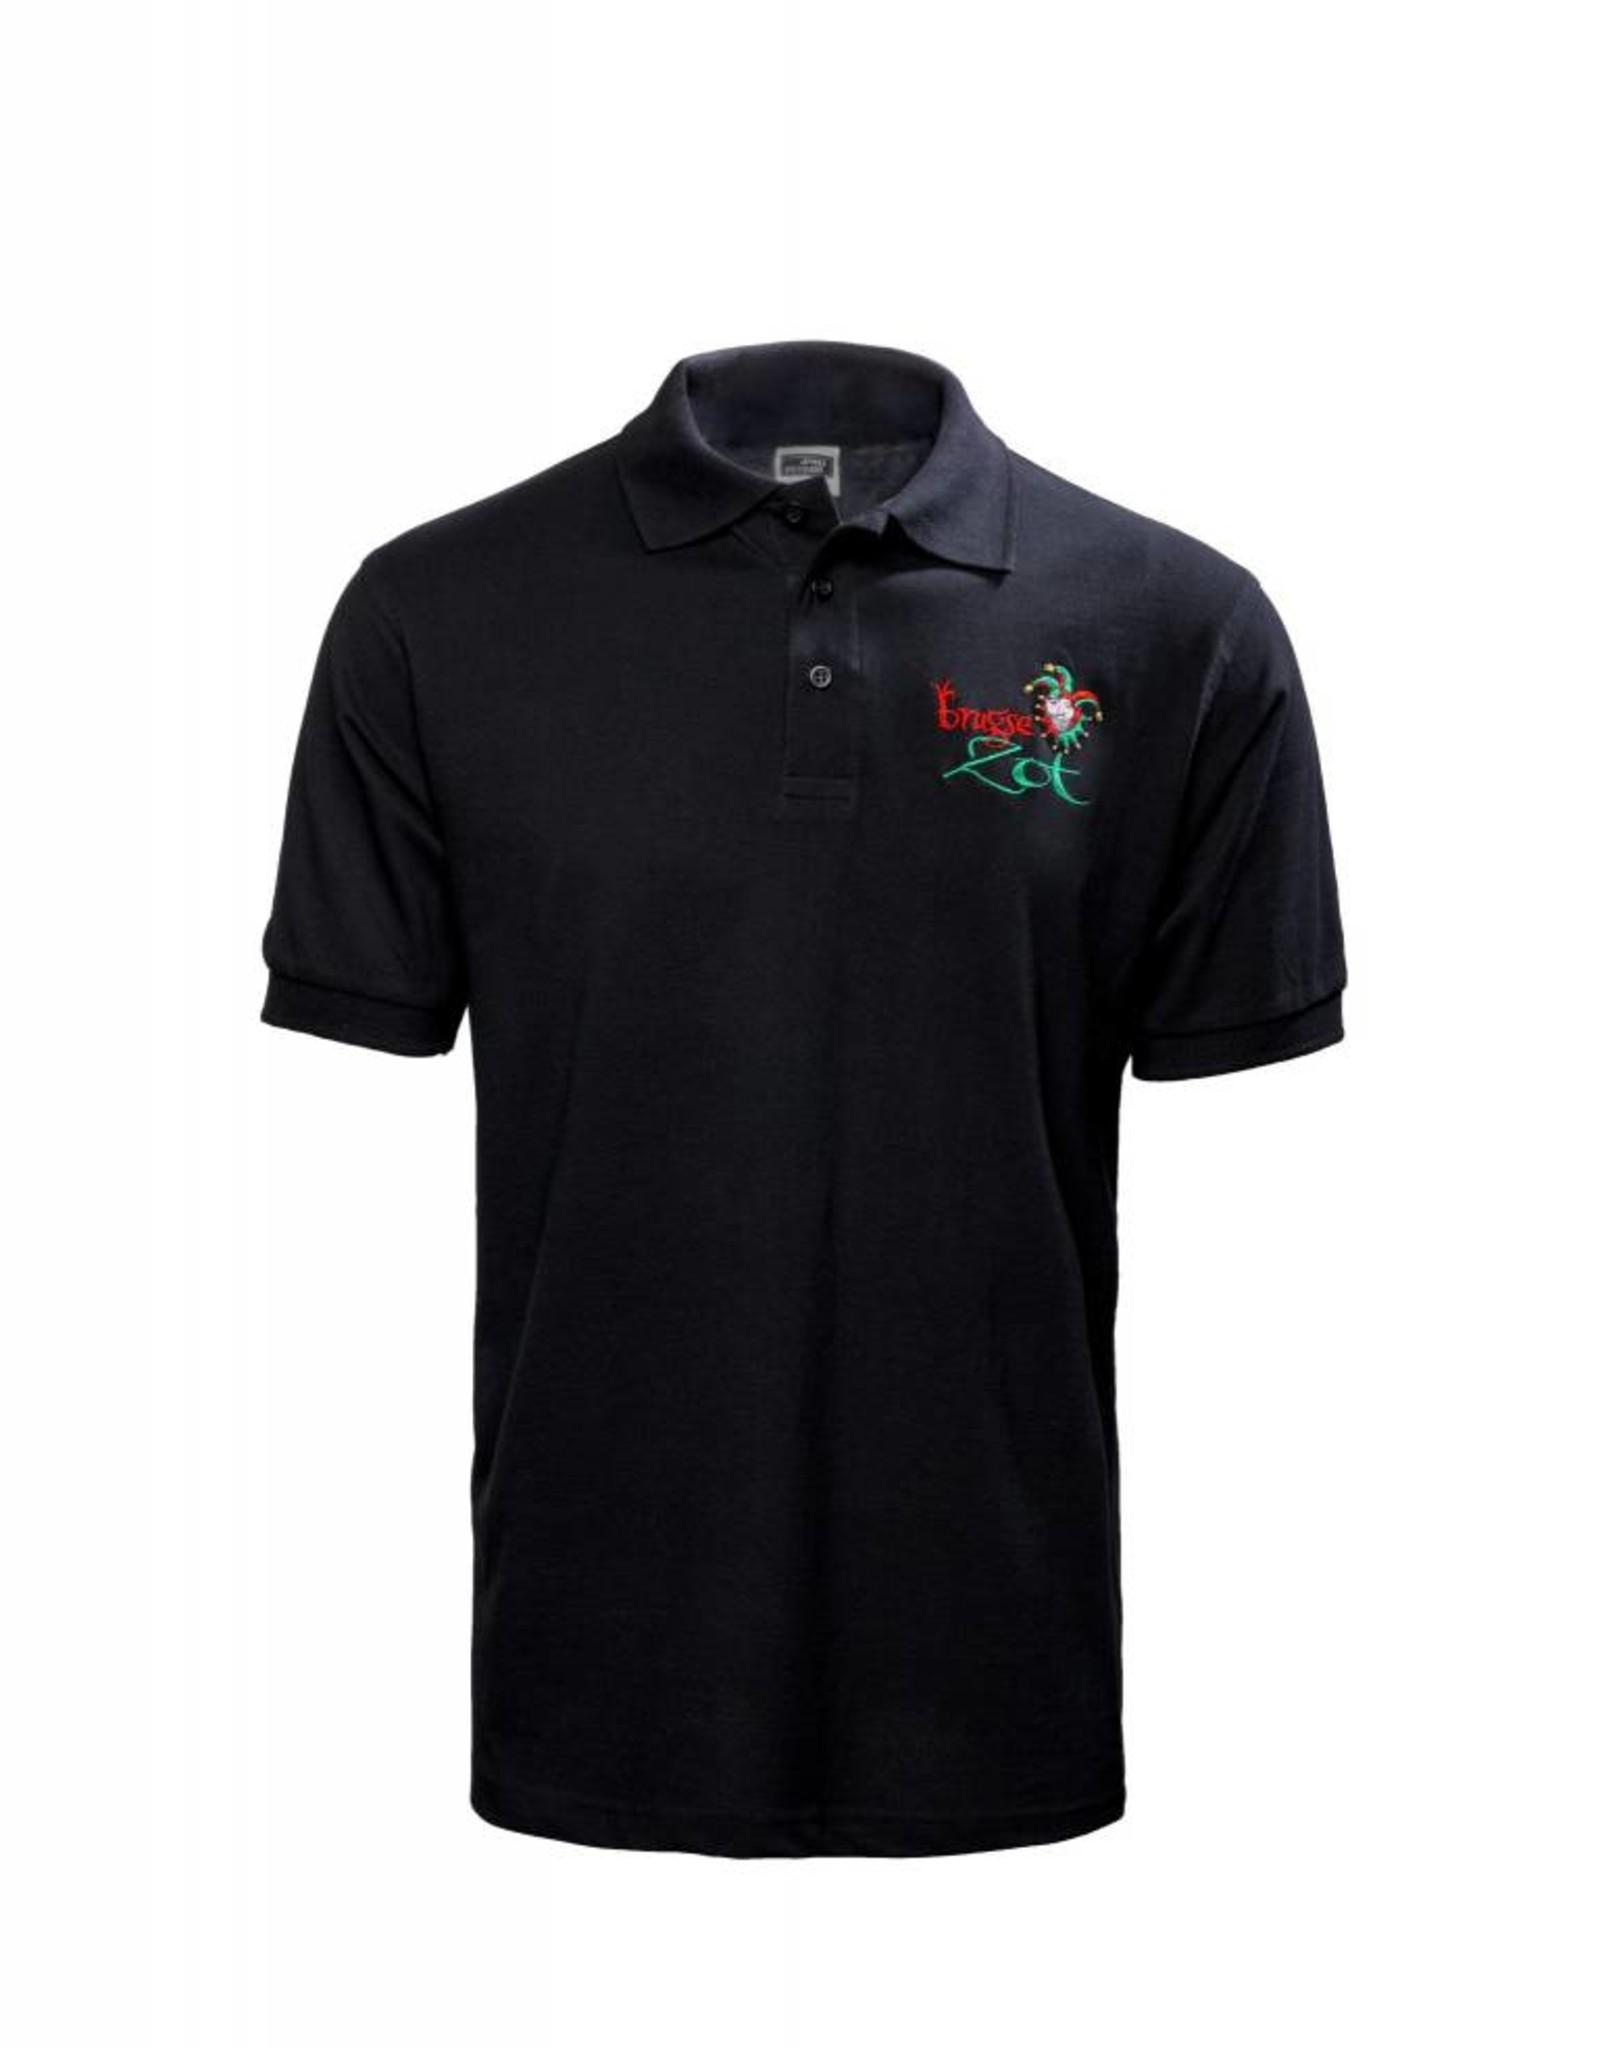 Brugse Zot polo shirt ladies